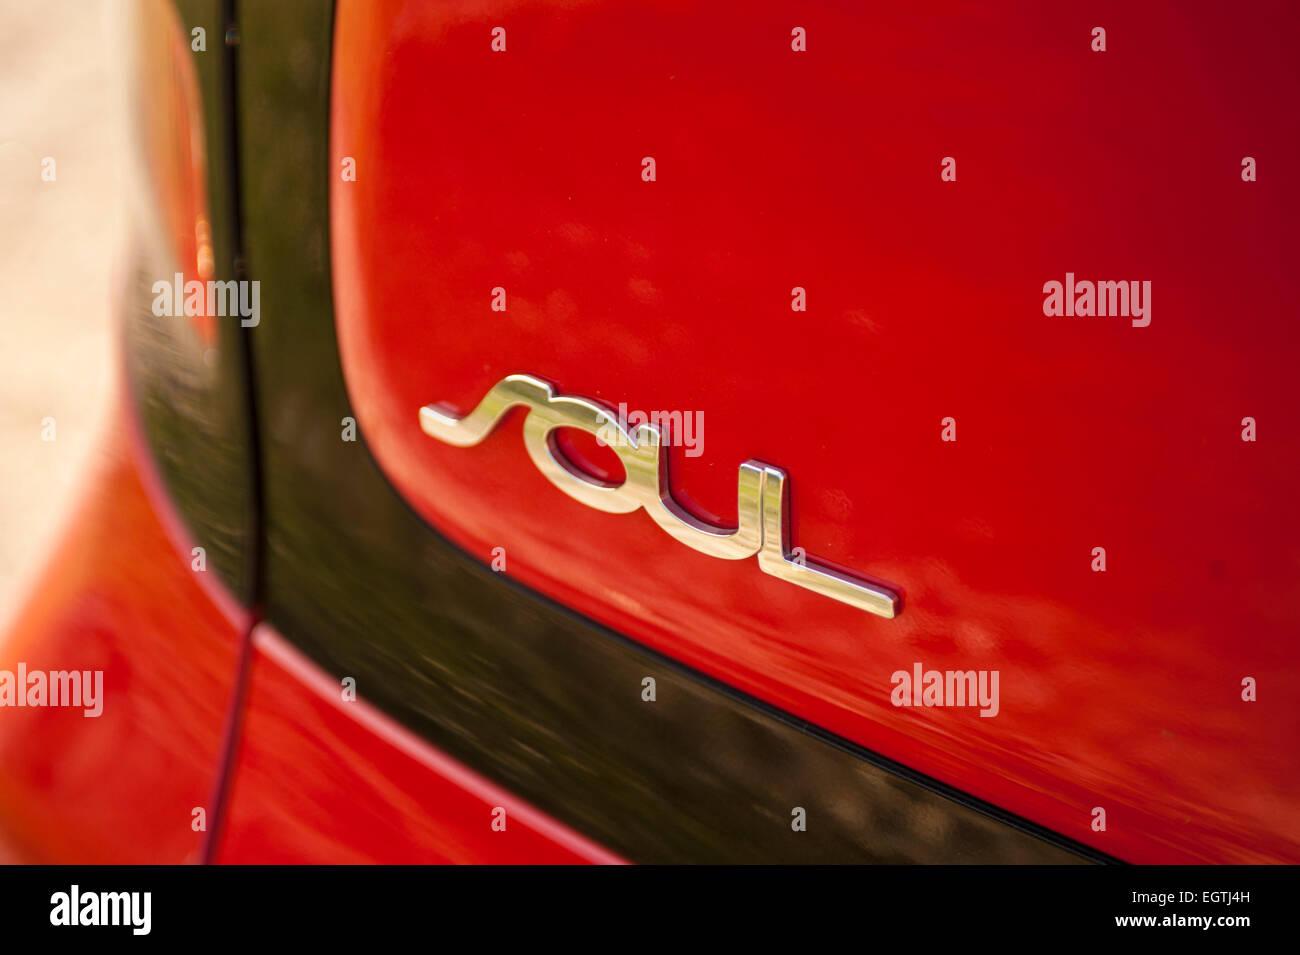 Kia Soul - Stock Image